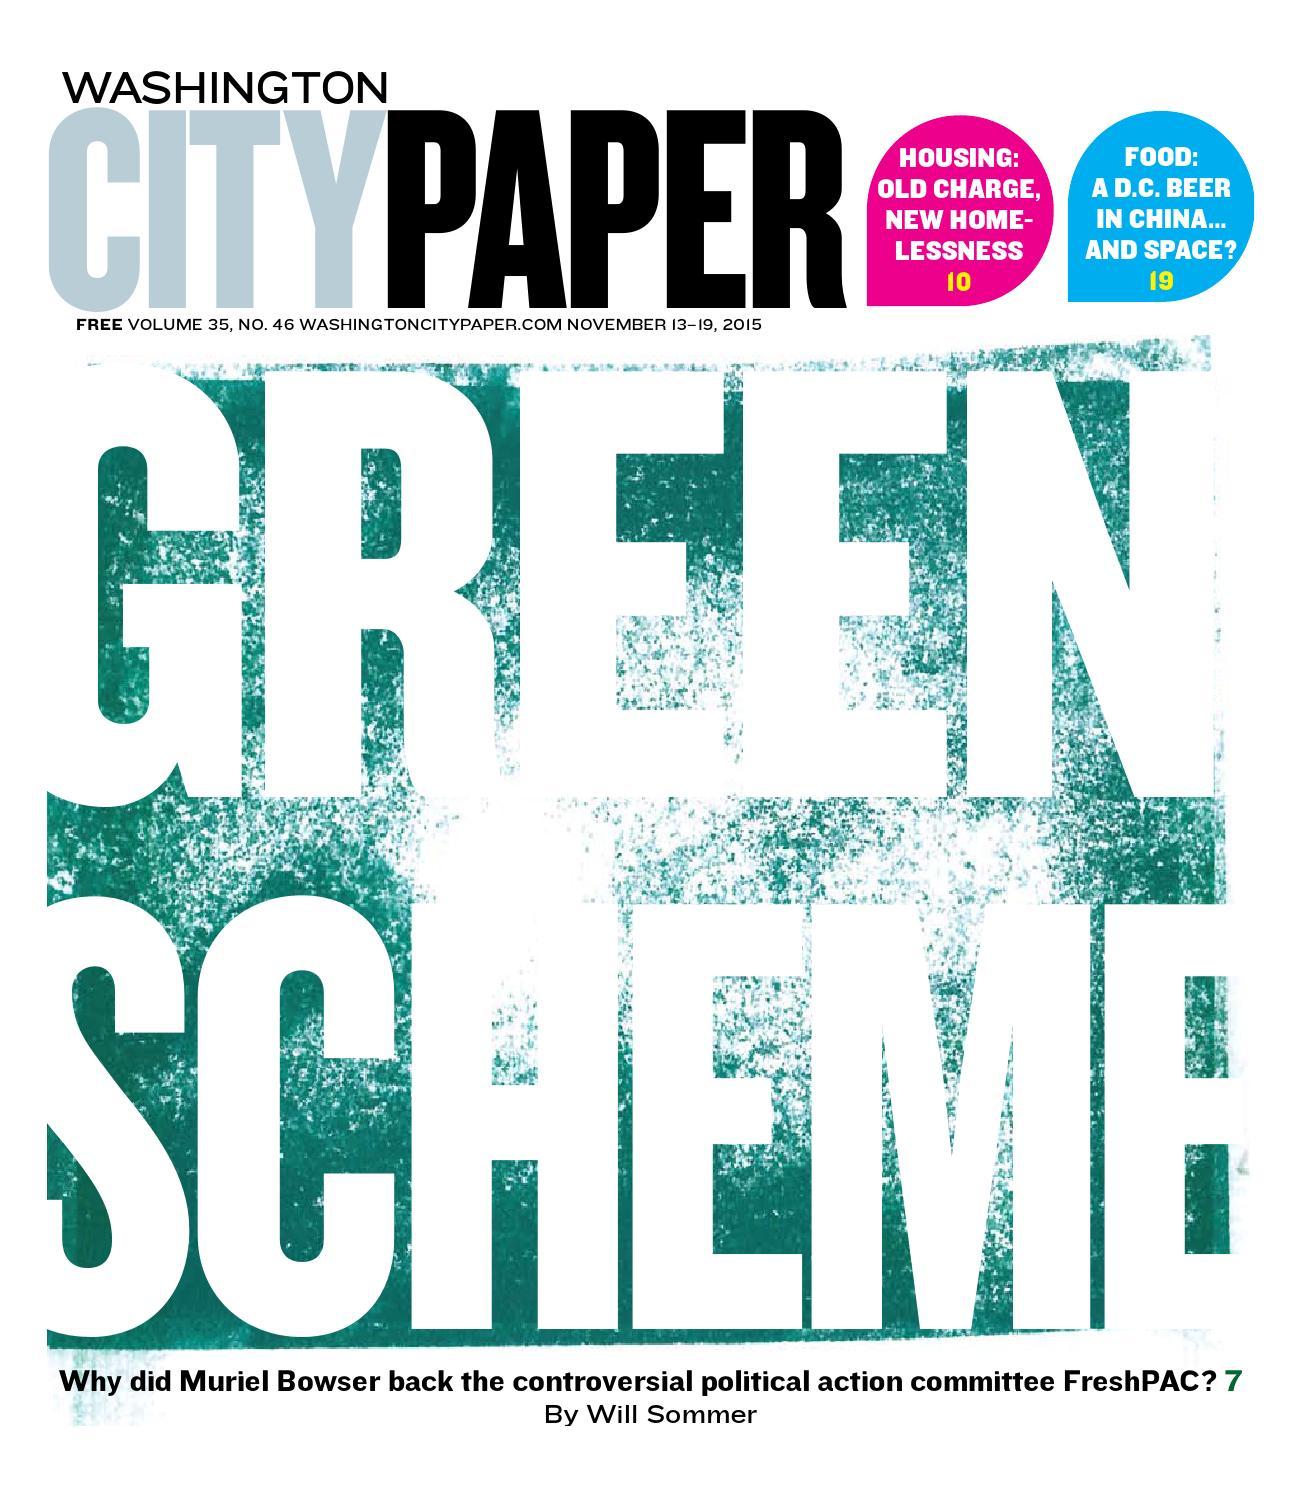 2ed4c62baeb7 Washington City Paper (November 13